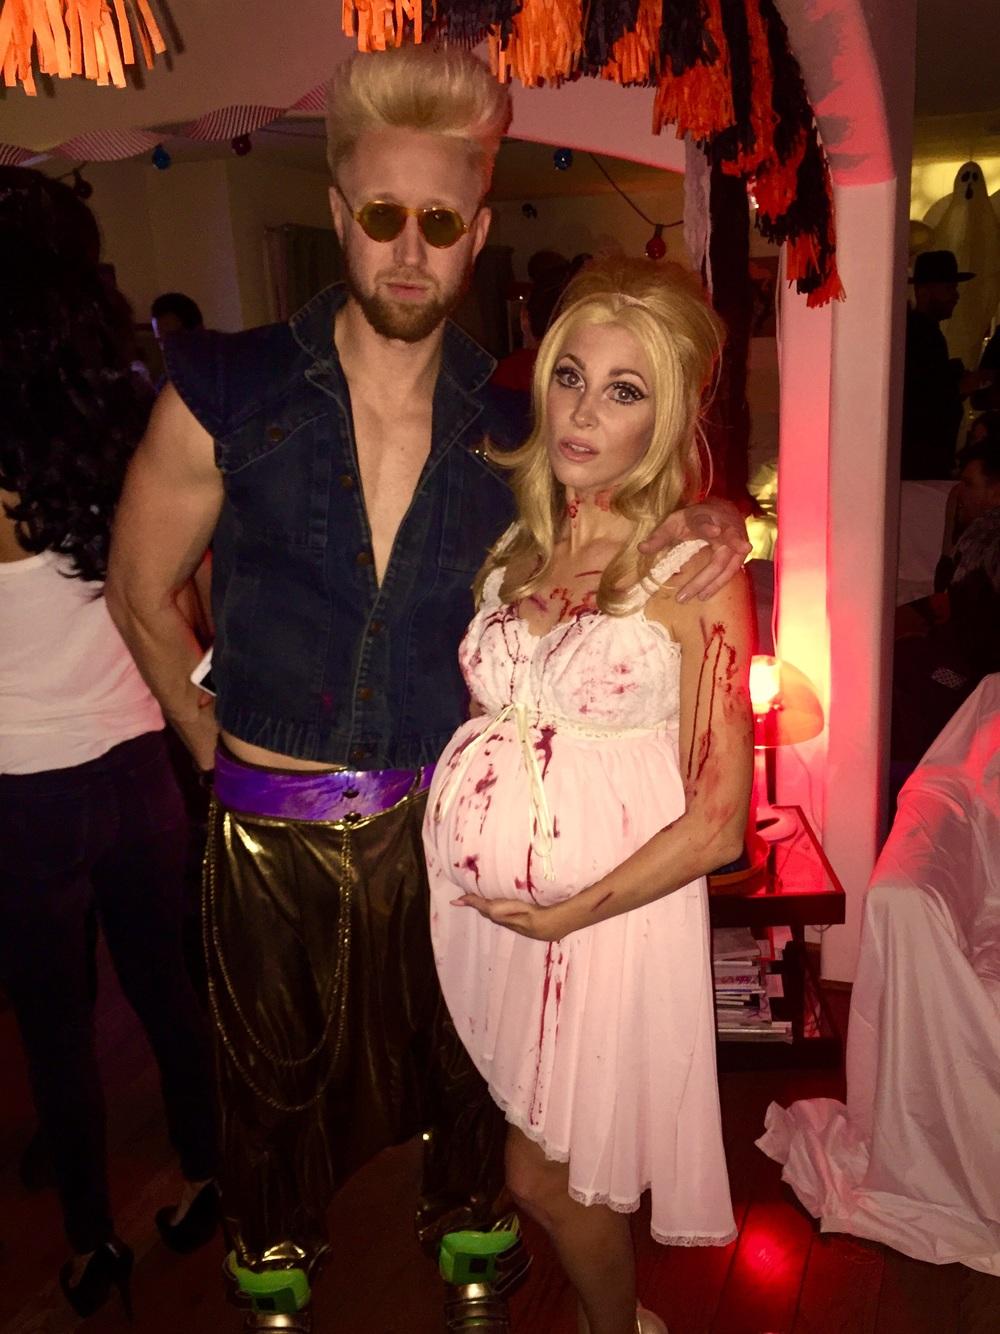 Jon Asher and Bonnie McKee at Bonnie's Halloween extravaganza!